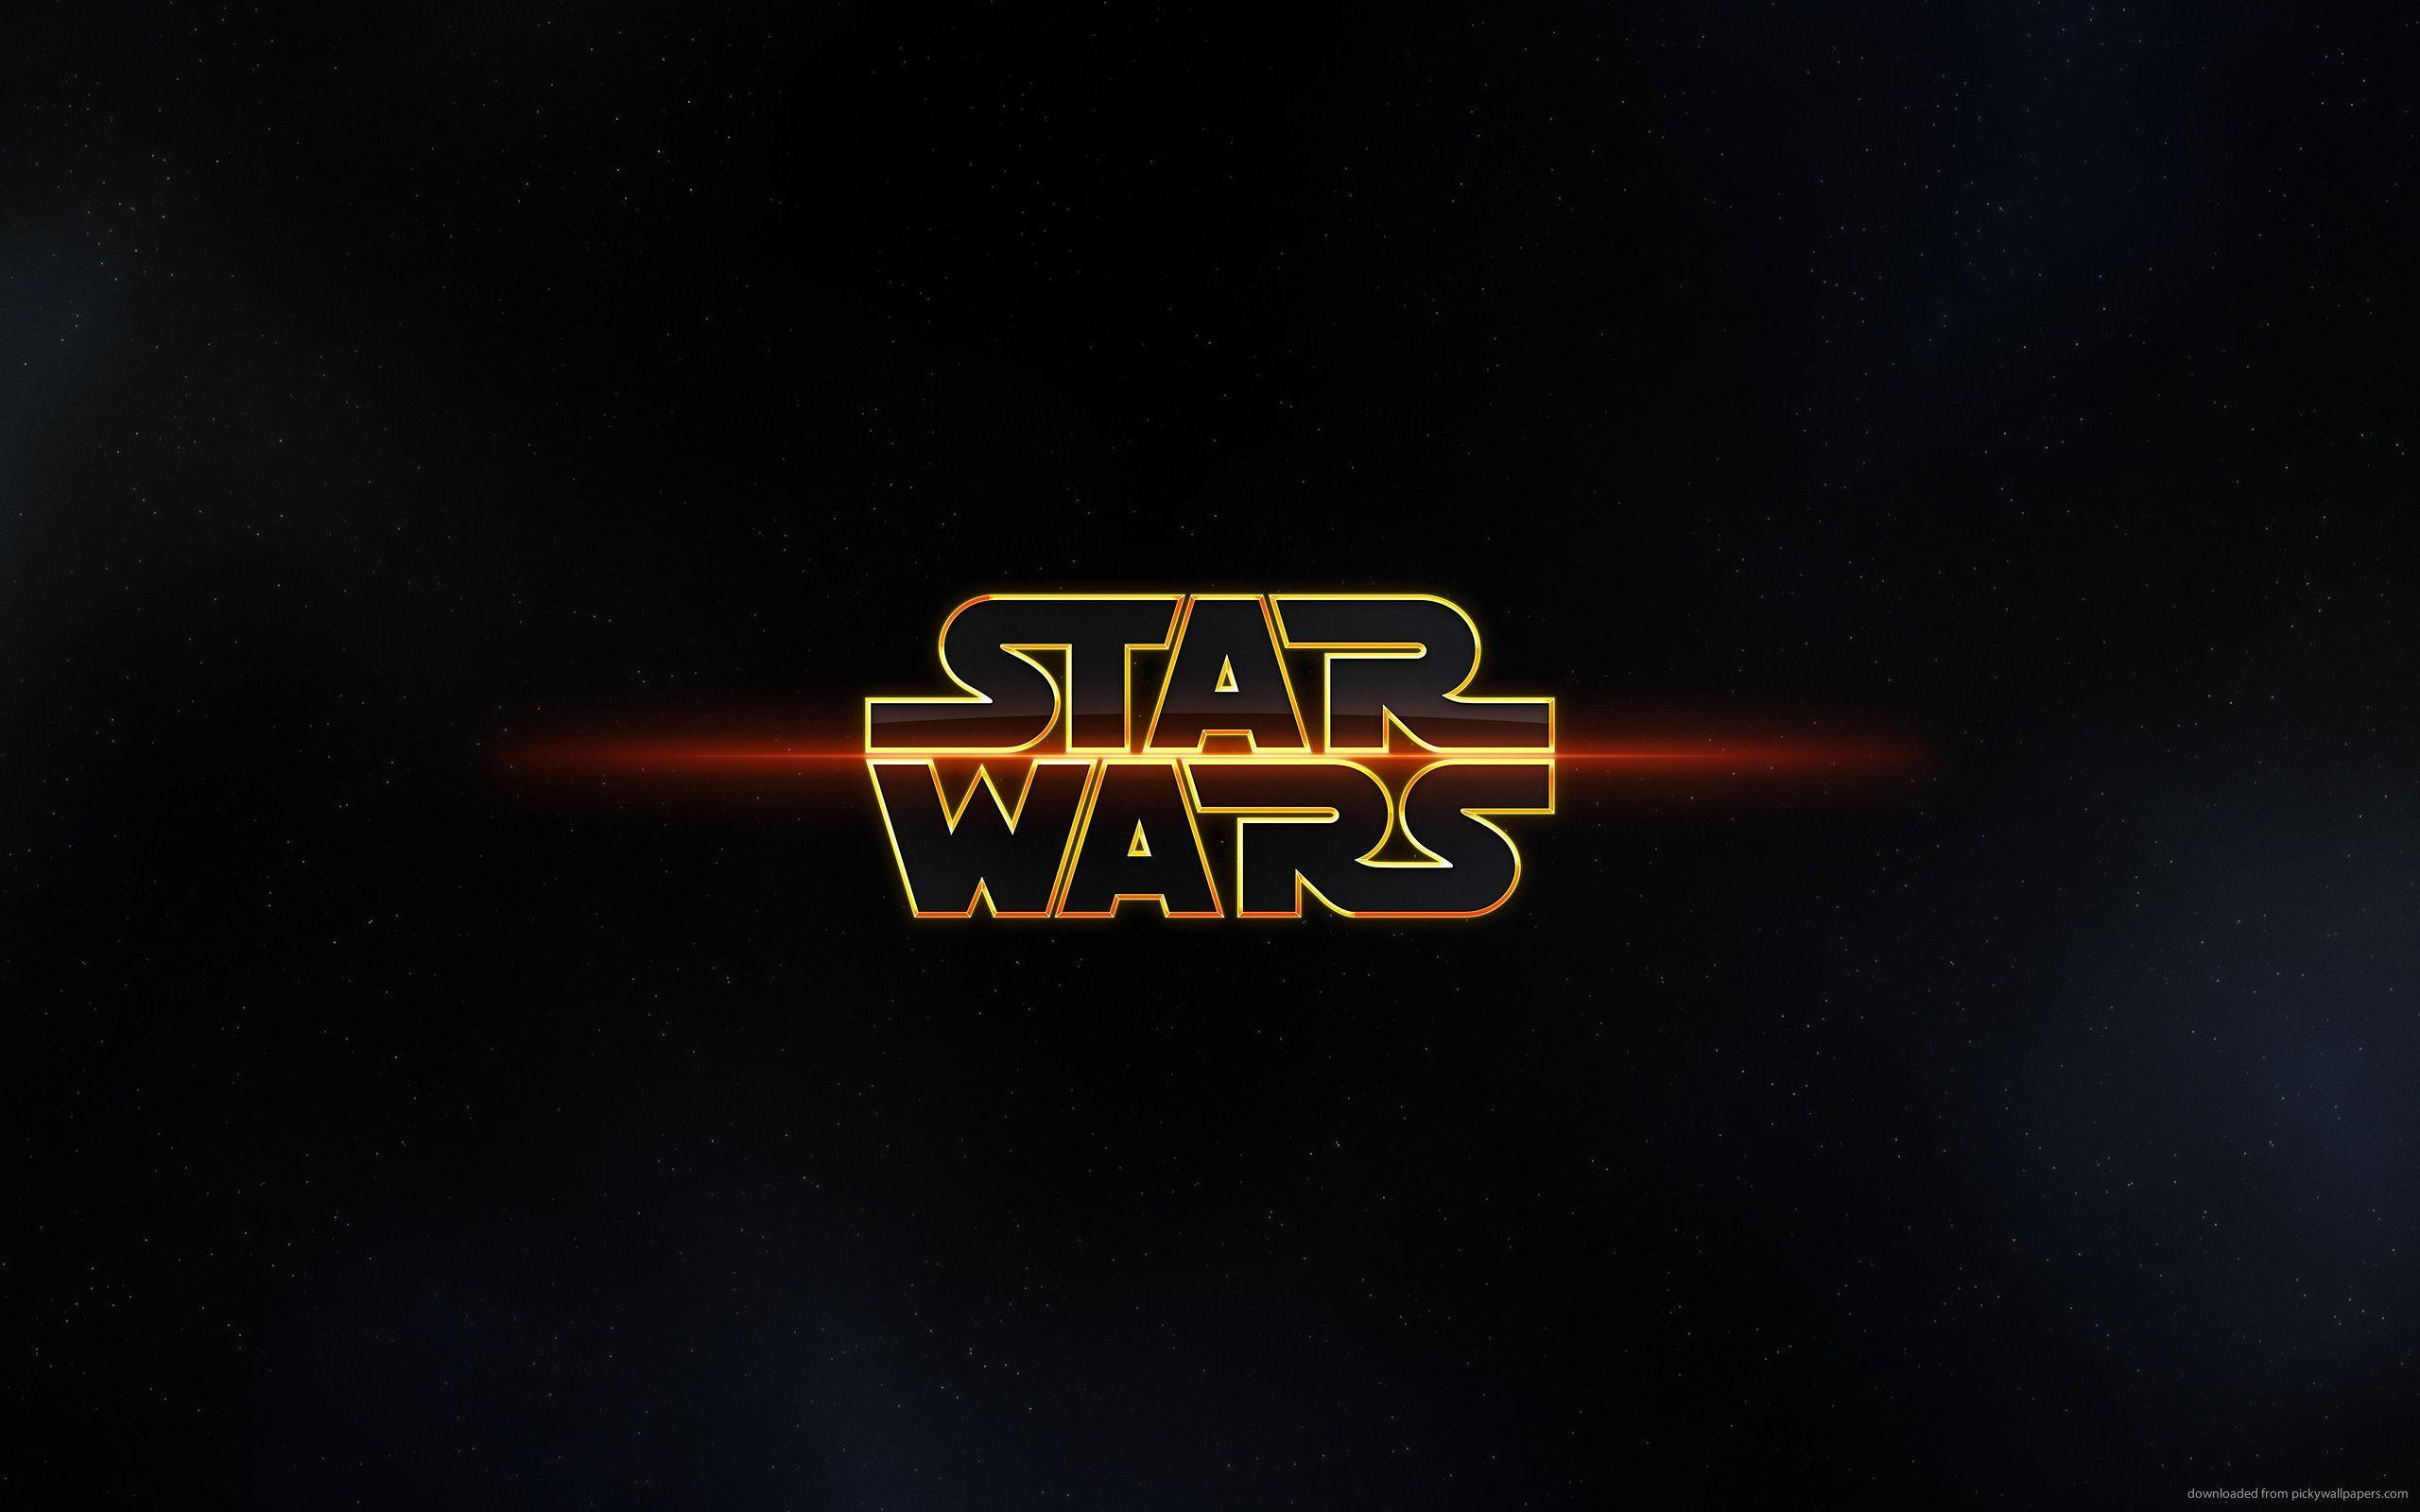 Star Wars Wallpapers Full Hd Wallpaper Search Star Wars Wallpaper Star Wars Pictures Star Wars Room